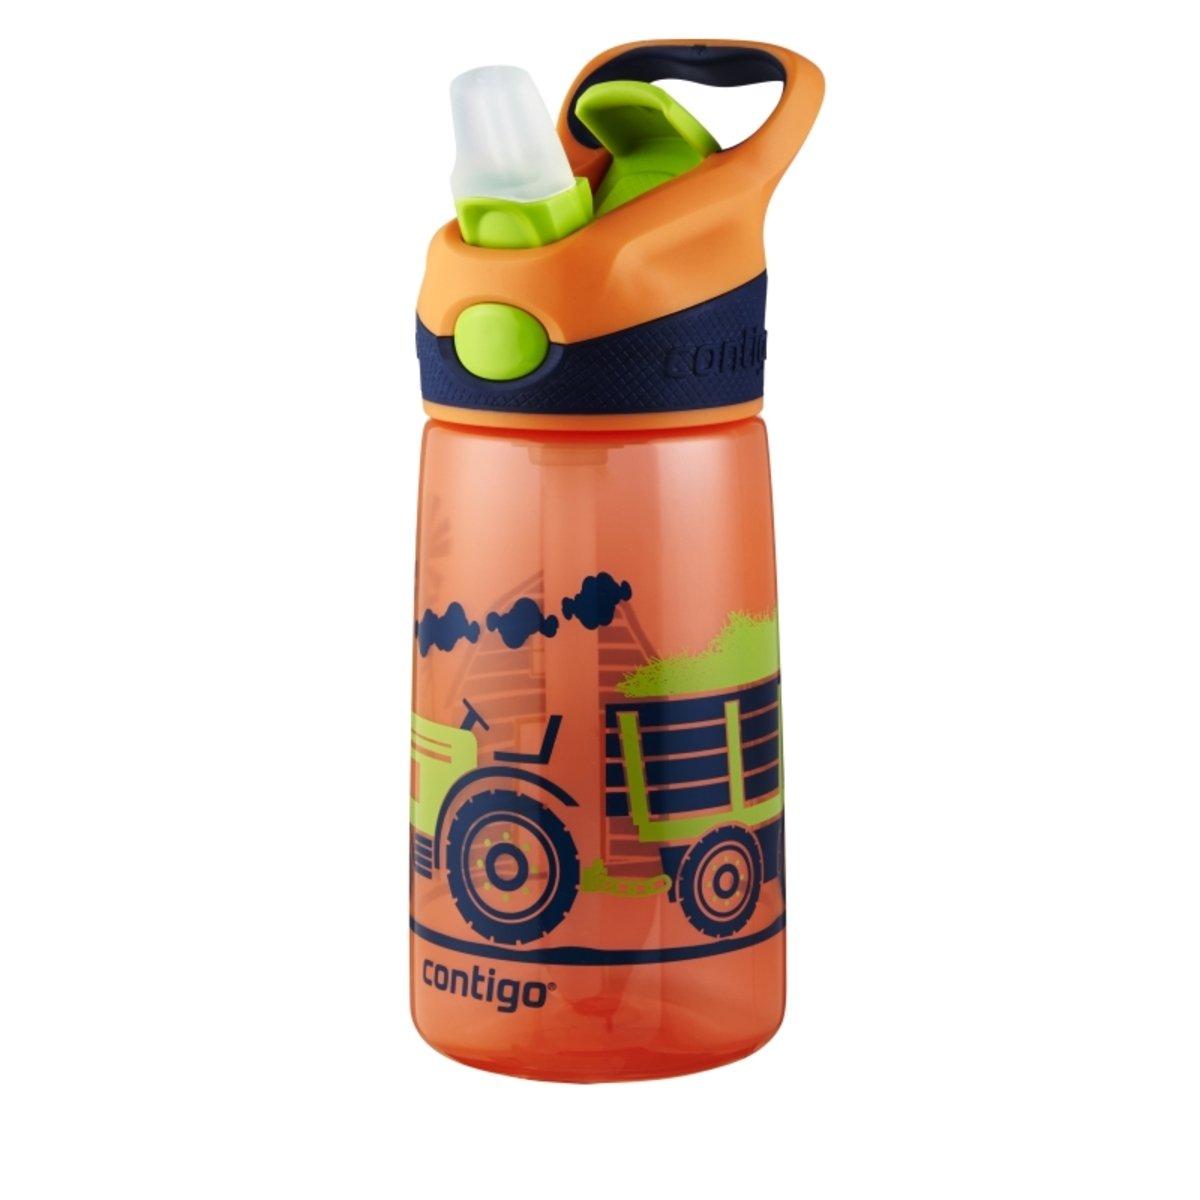 Striker 兒童自動吸管杯 - 橙色拉機